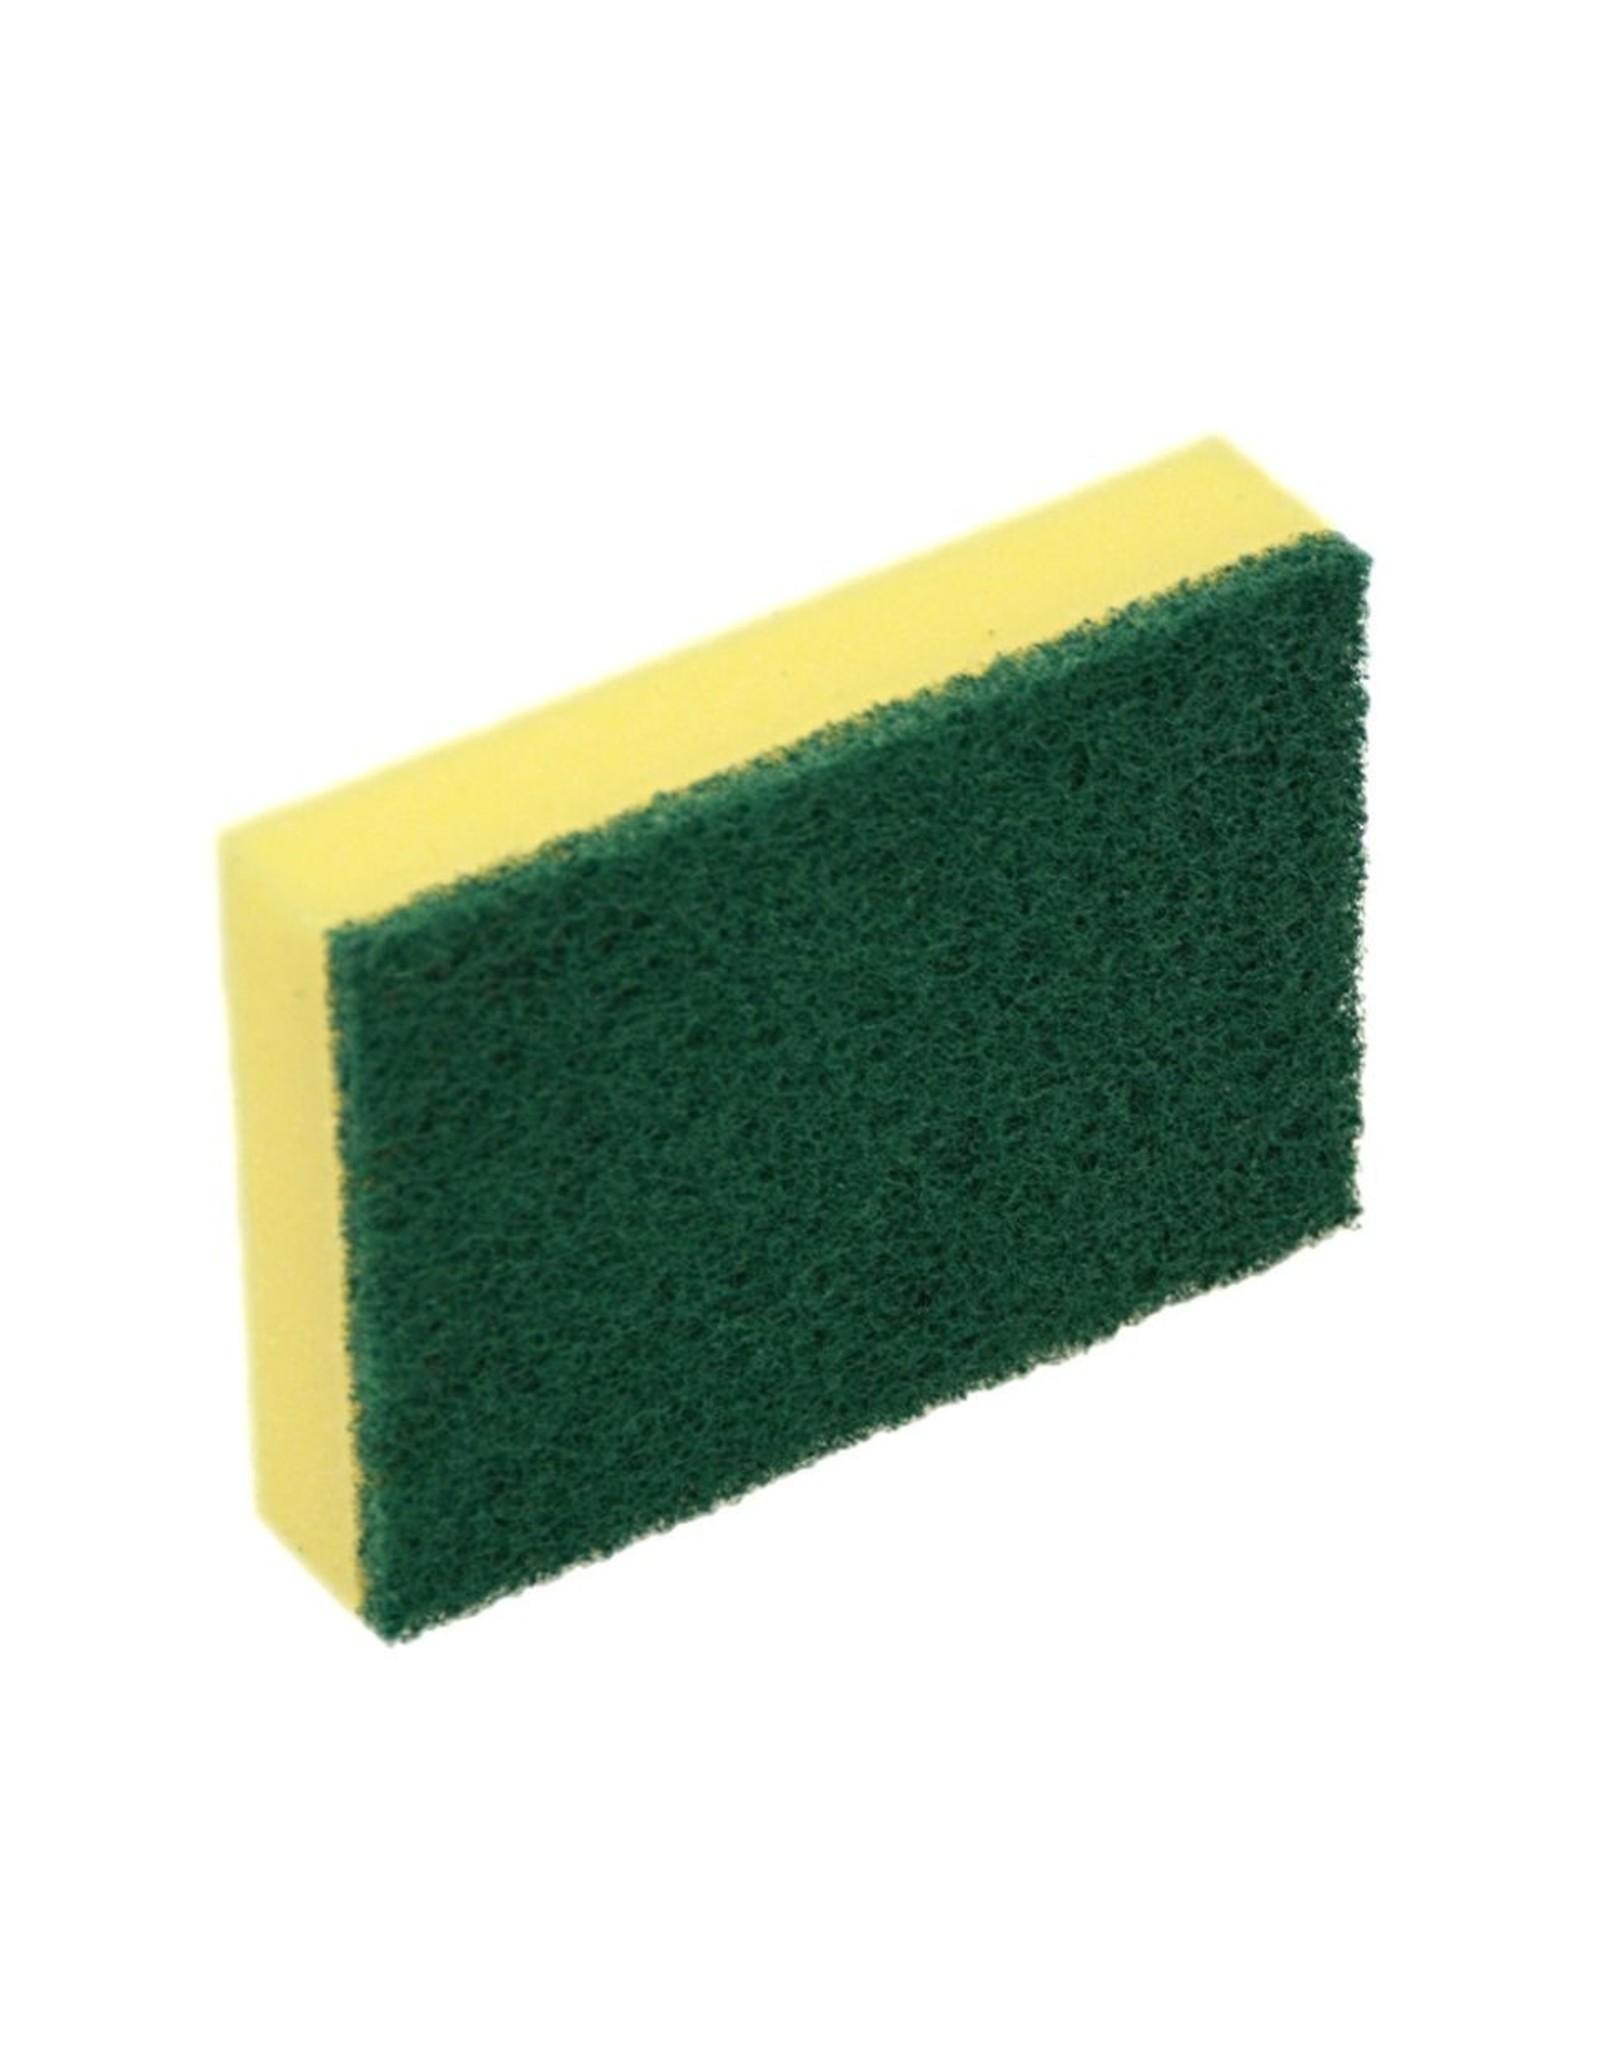 ACOR Reinigingsspons 10 stuks geel / groene pad. 10x7x3cm.